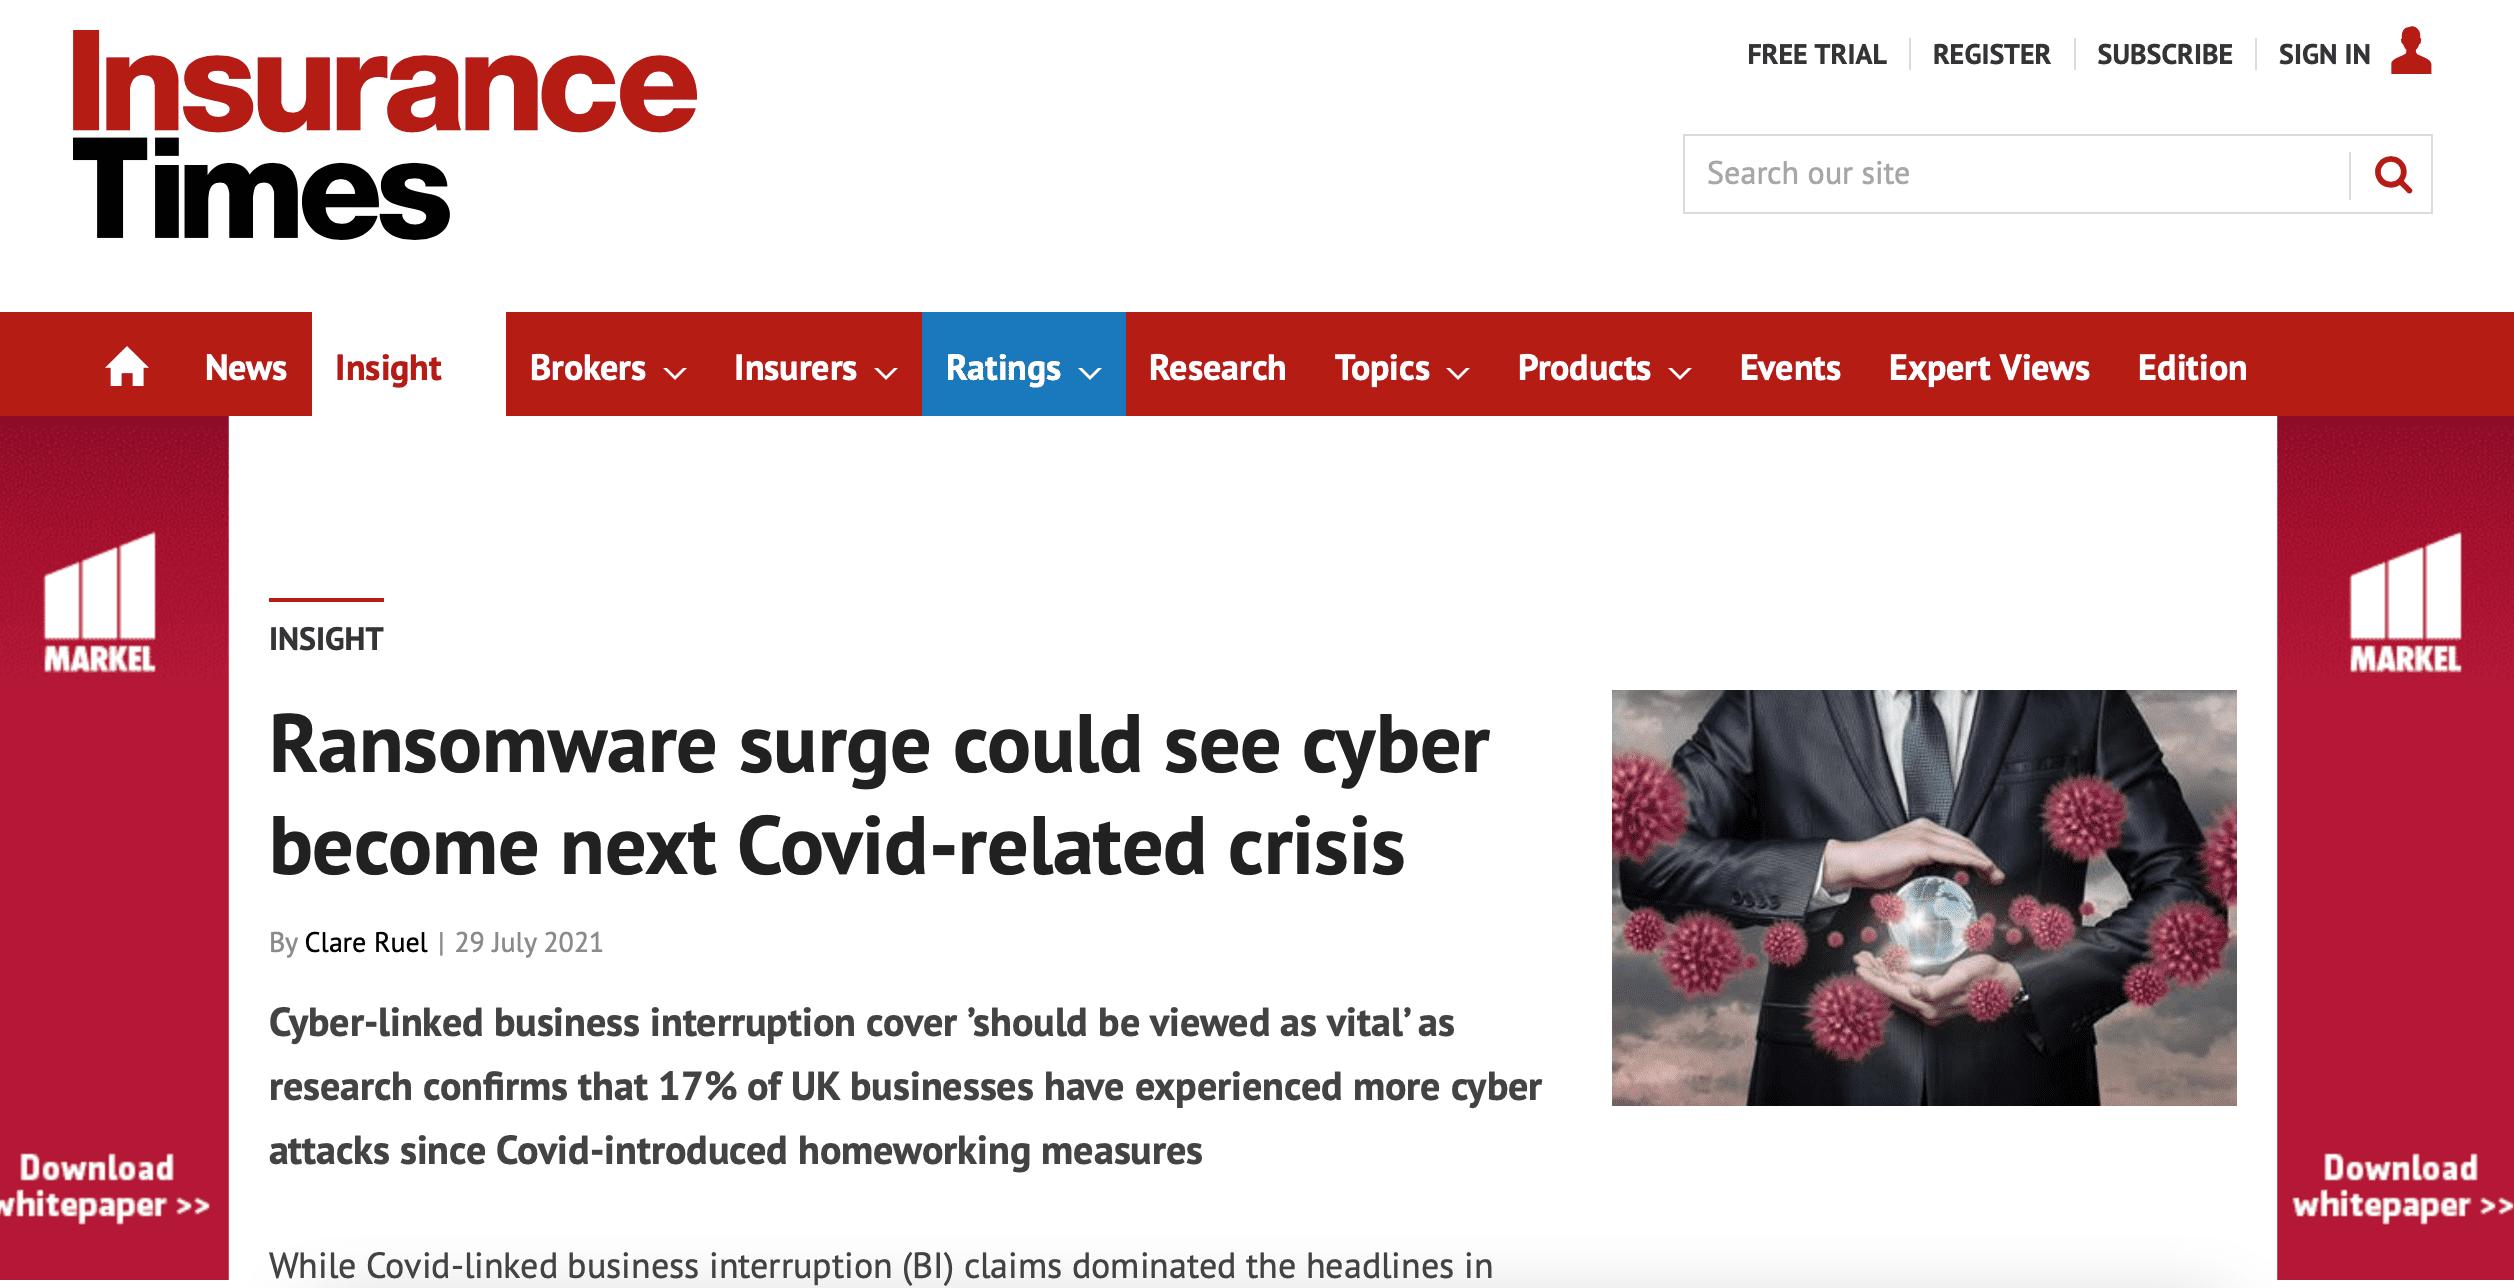 Ransomeware surge